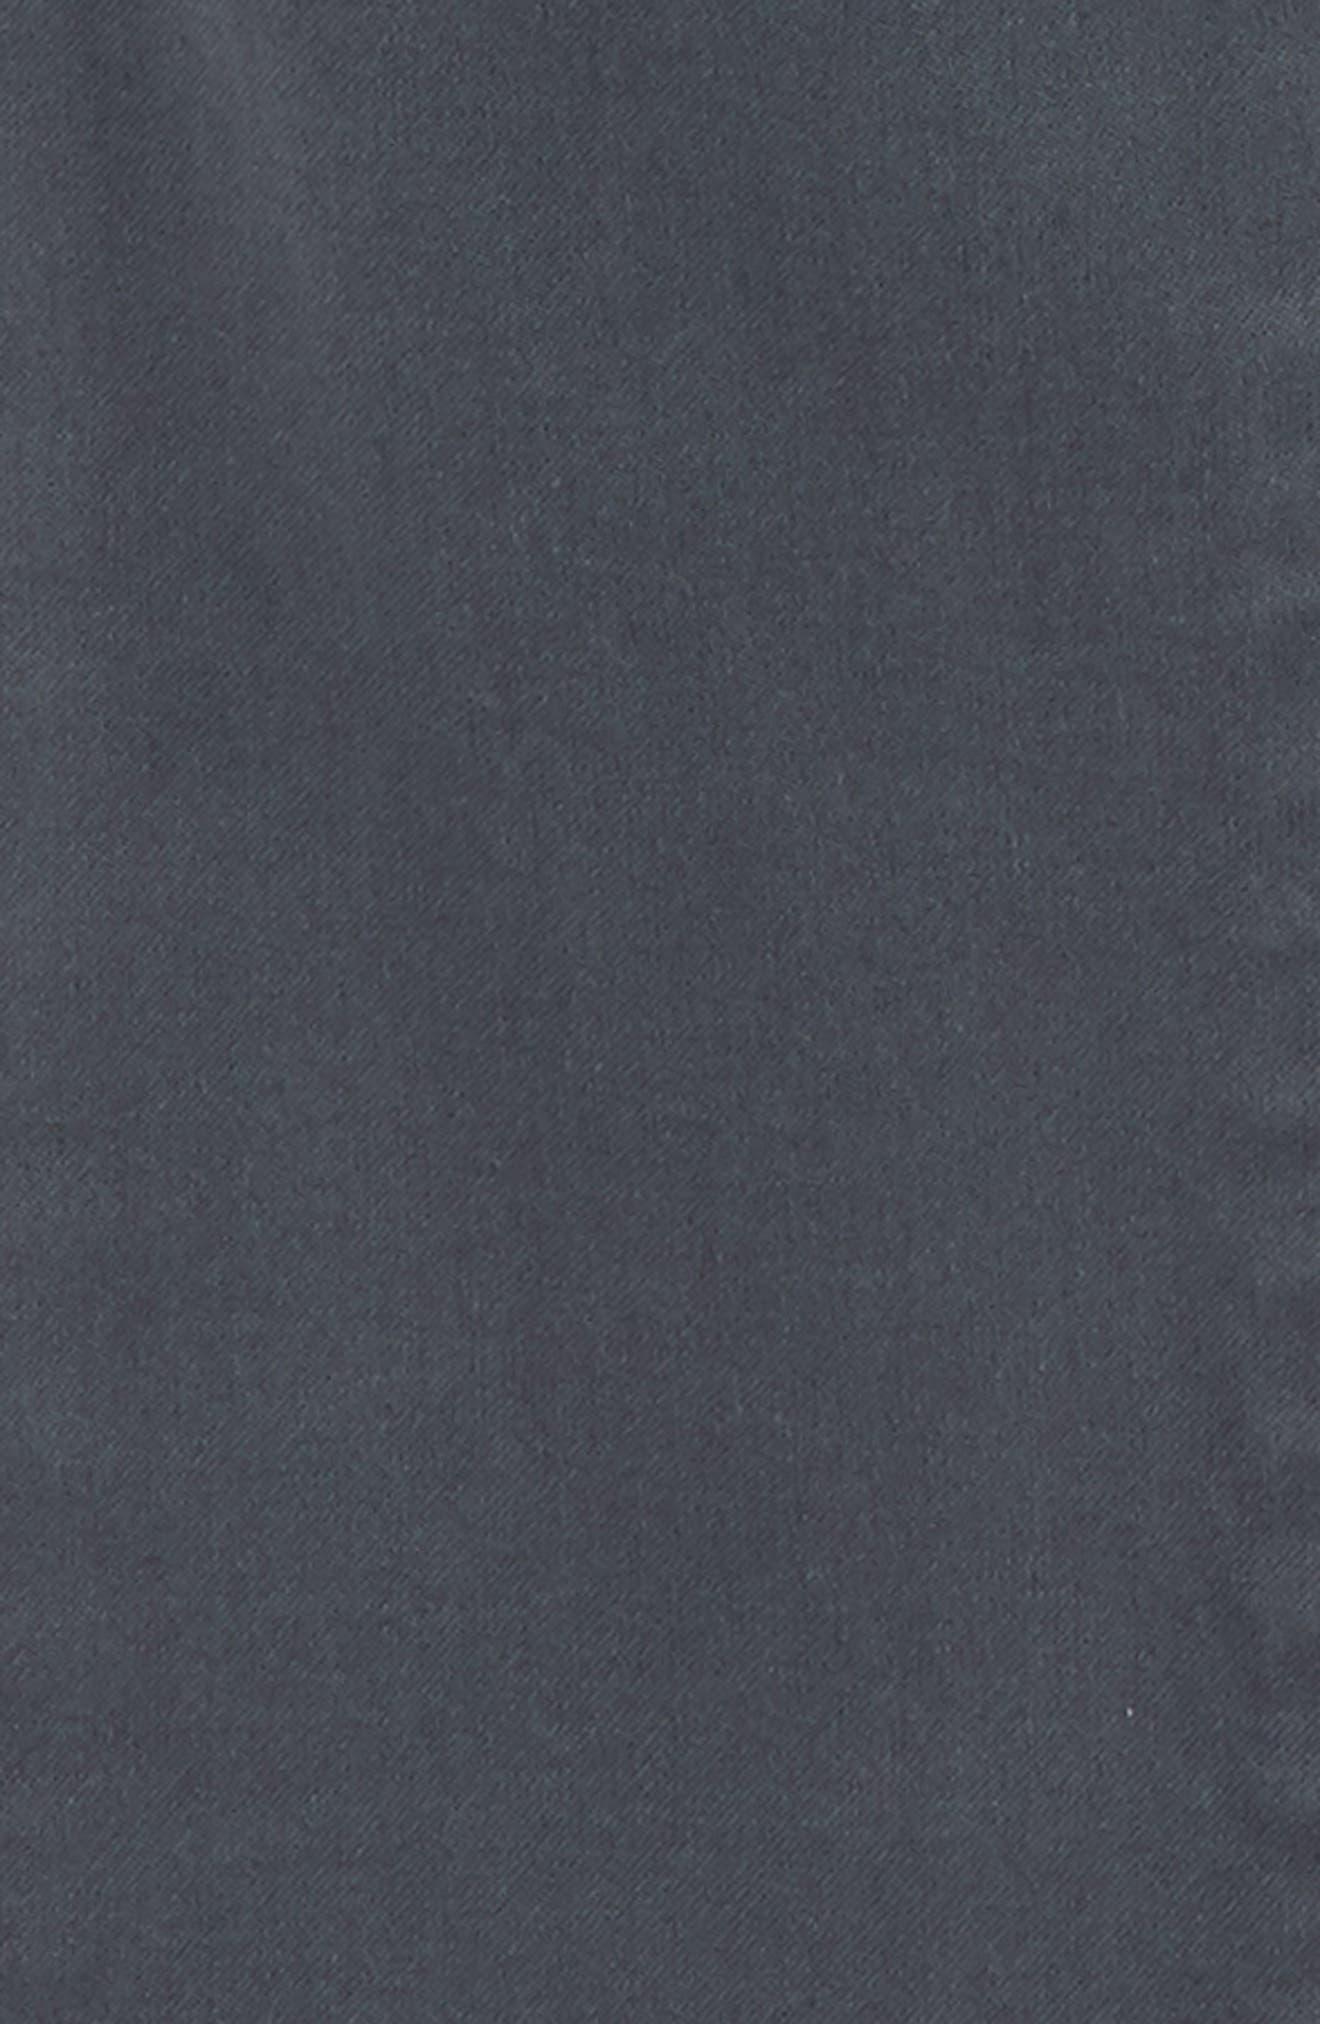 Brady Slim Fit Jeans,                             Alternate thumbnail 2, color,                             420